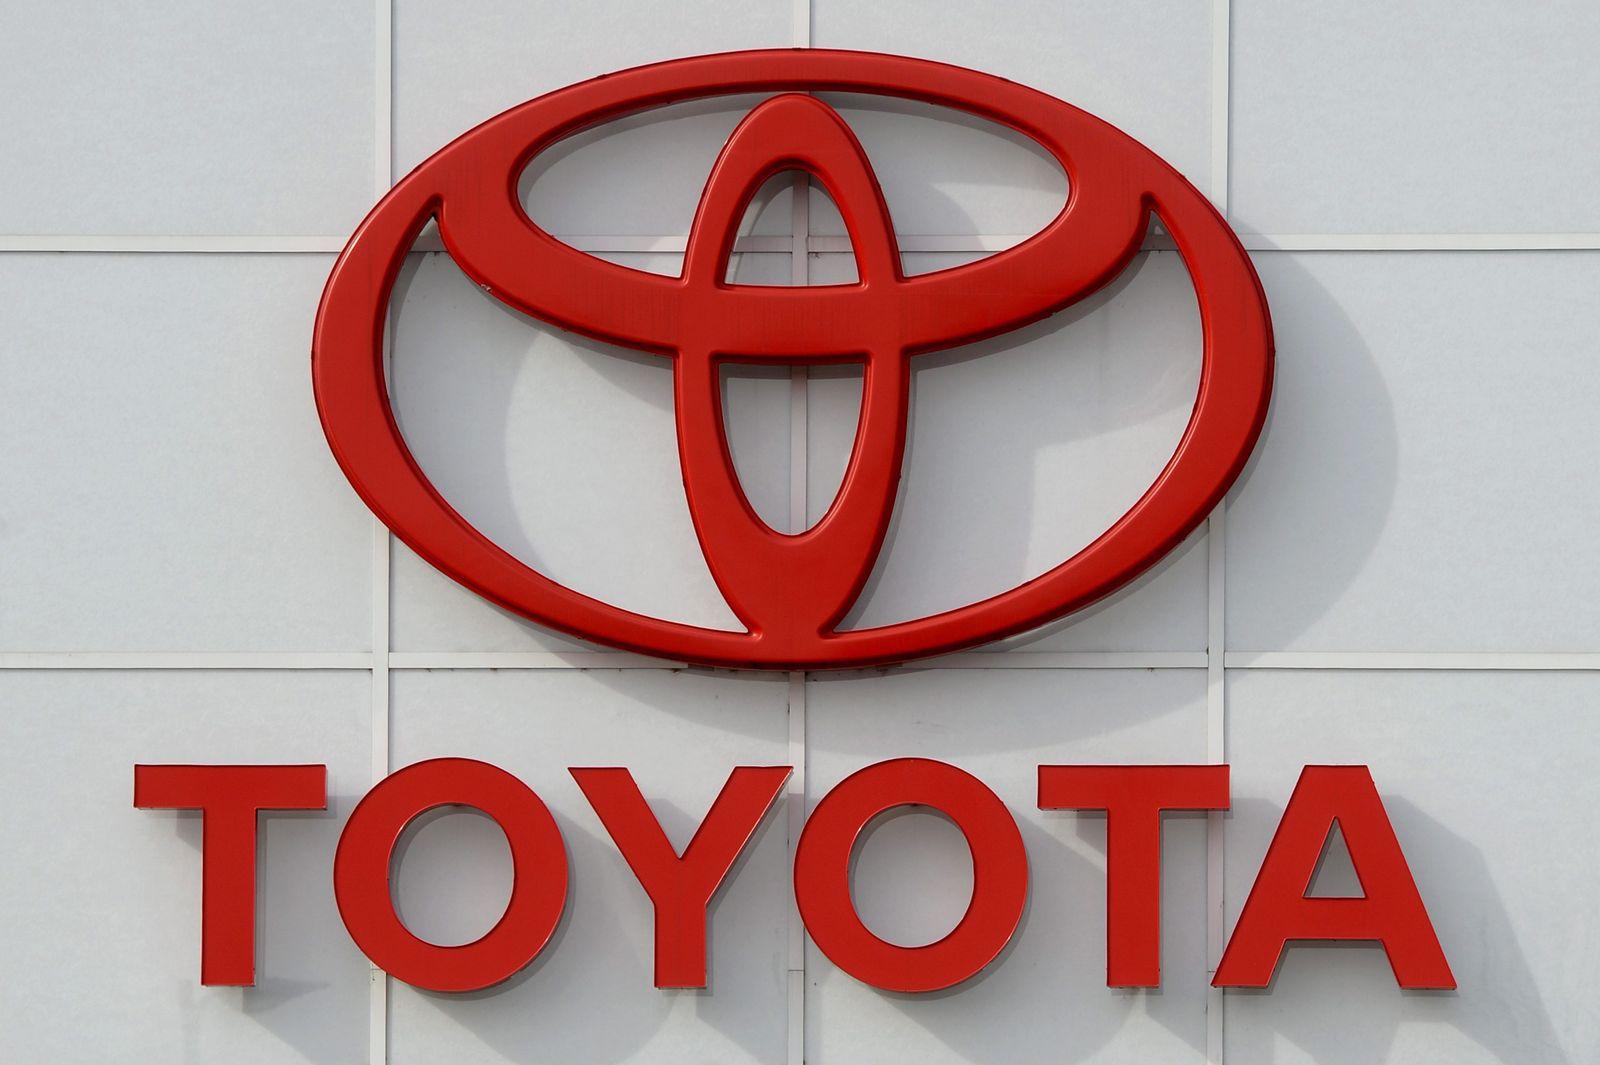 Toyota recalling 1.9 million hybrid Prius cars